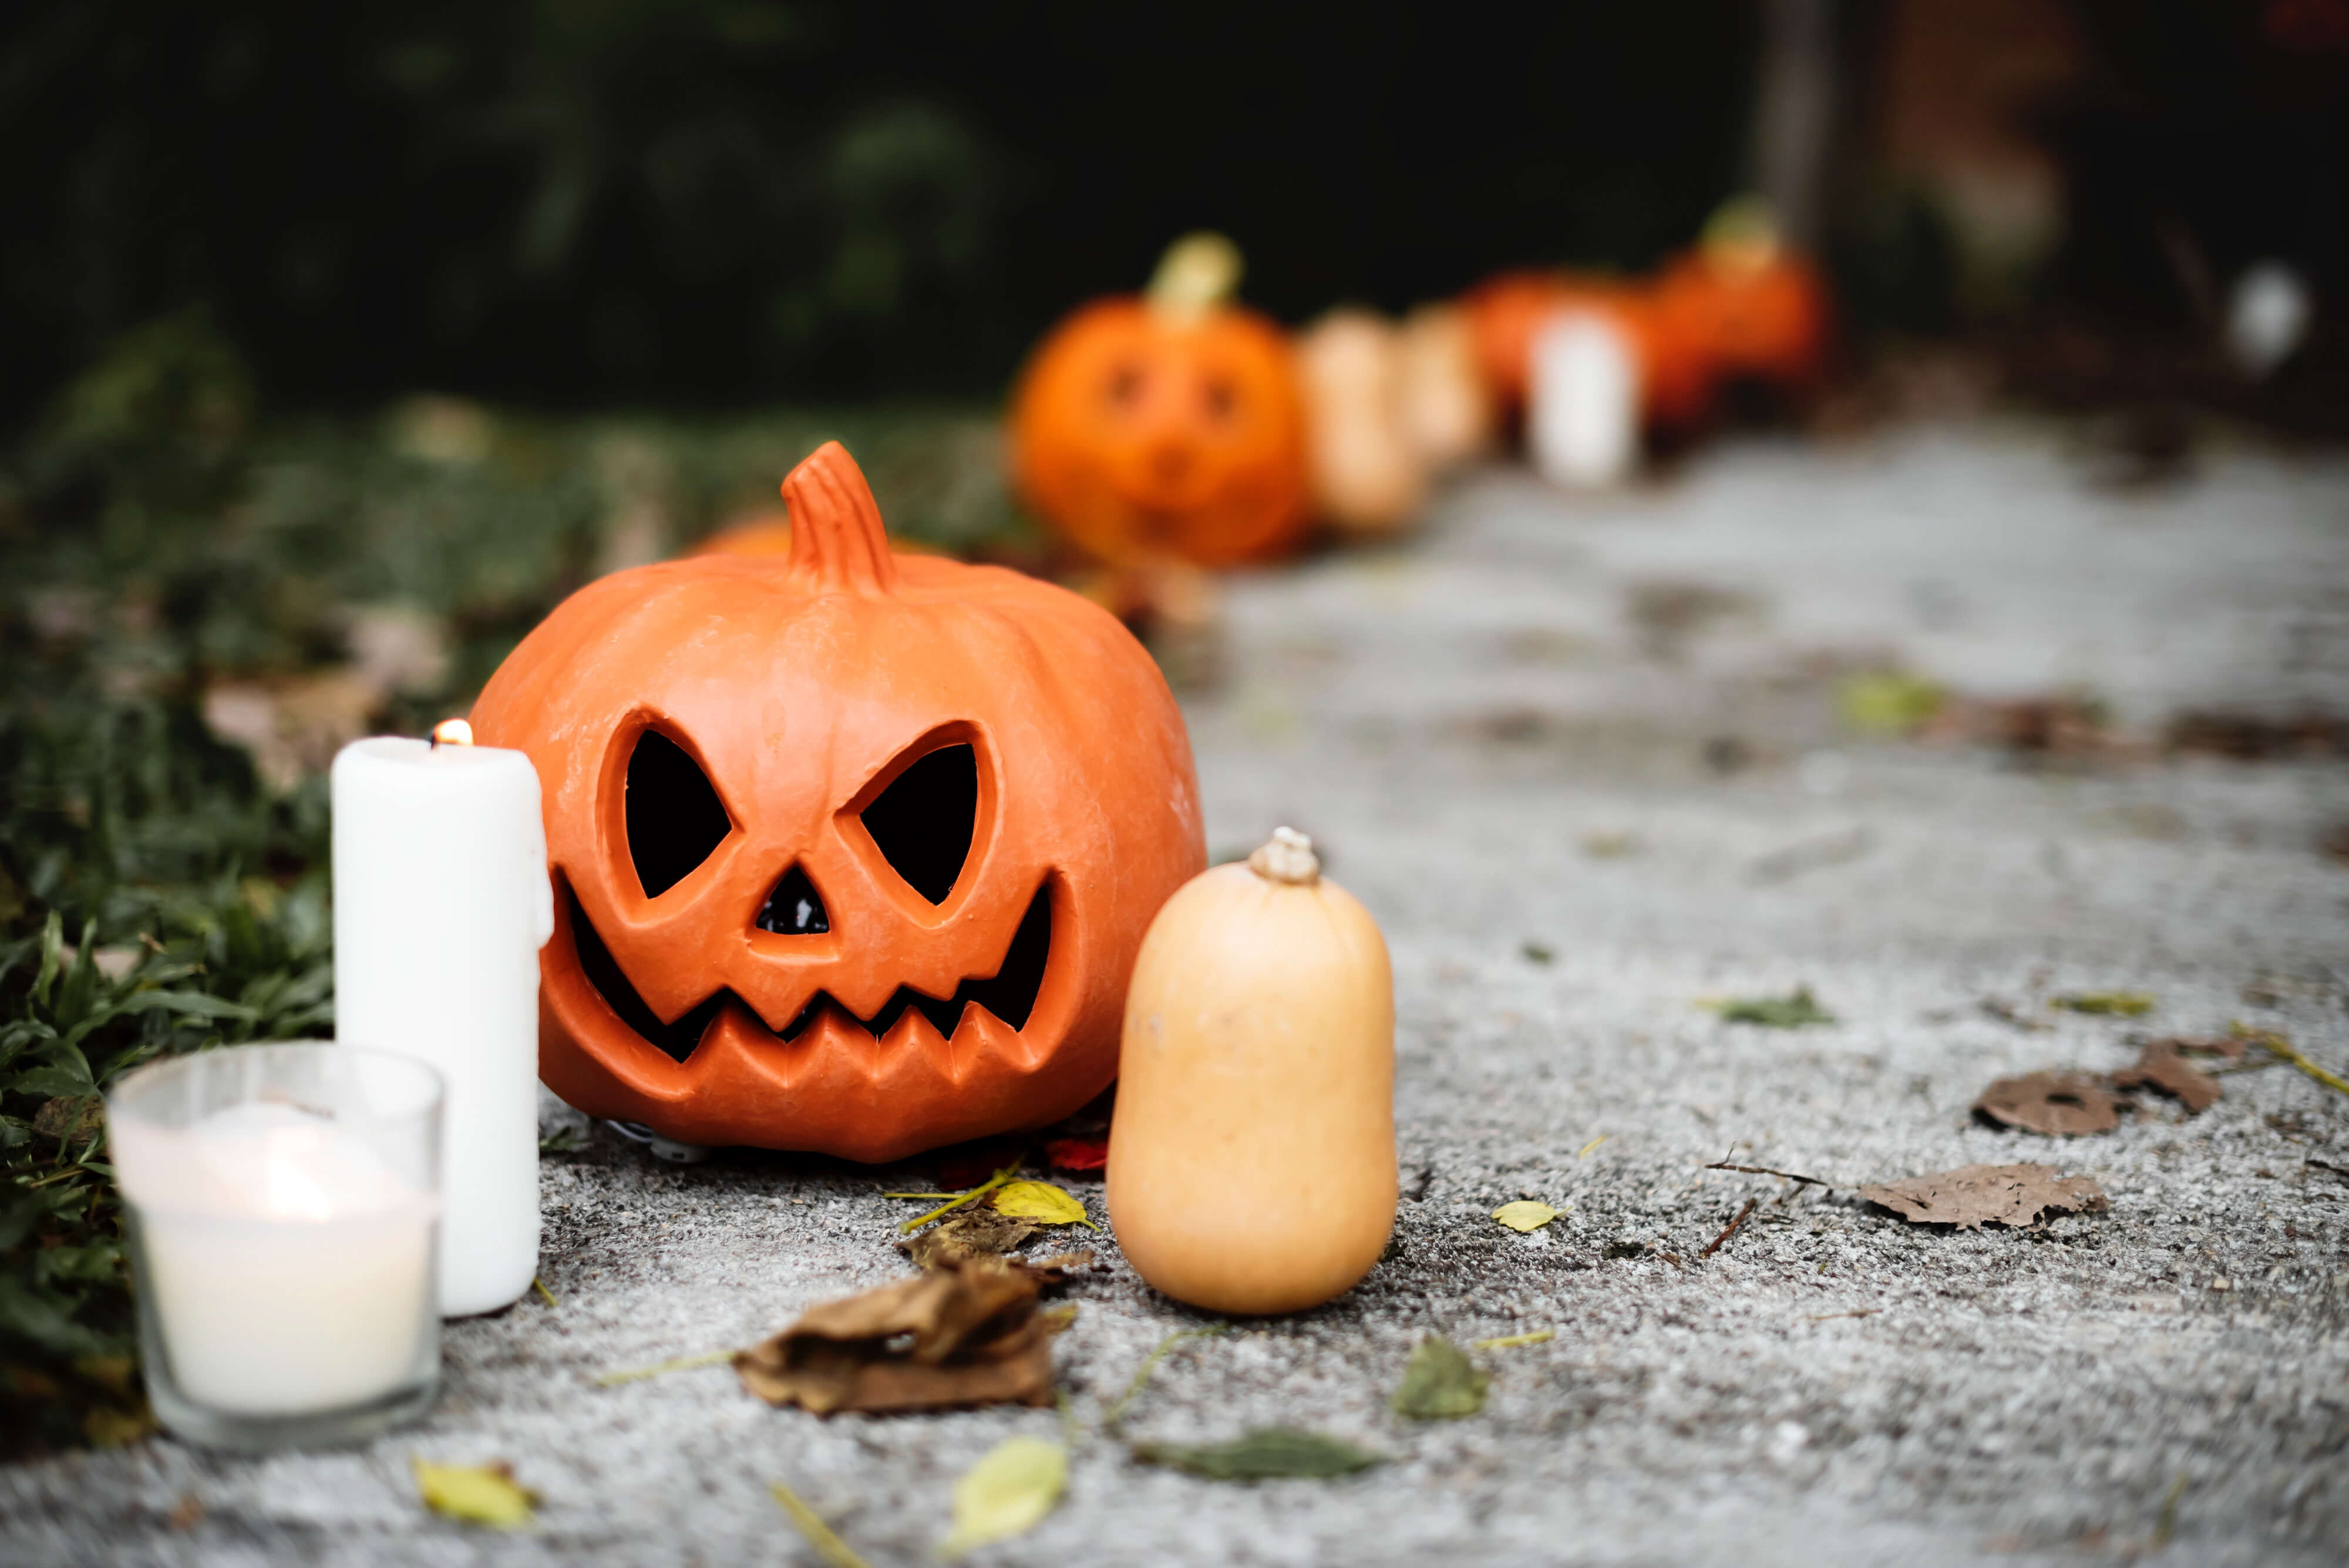 https://sleeklens.com/wp-content/uploads/2018/10/halloween-fall-lightroom-presets-sleeklens-before-3.jpg